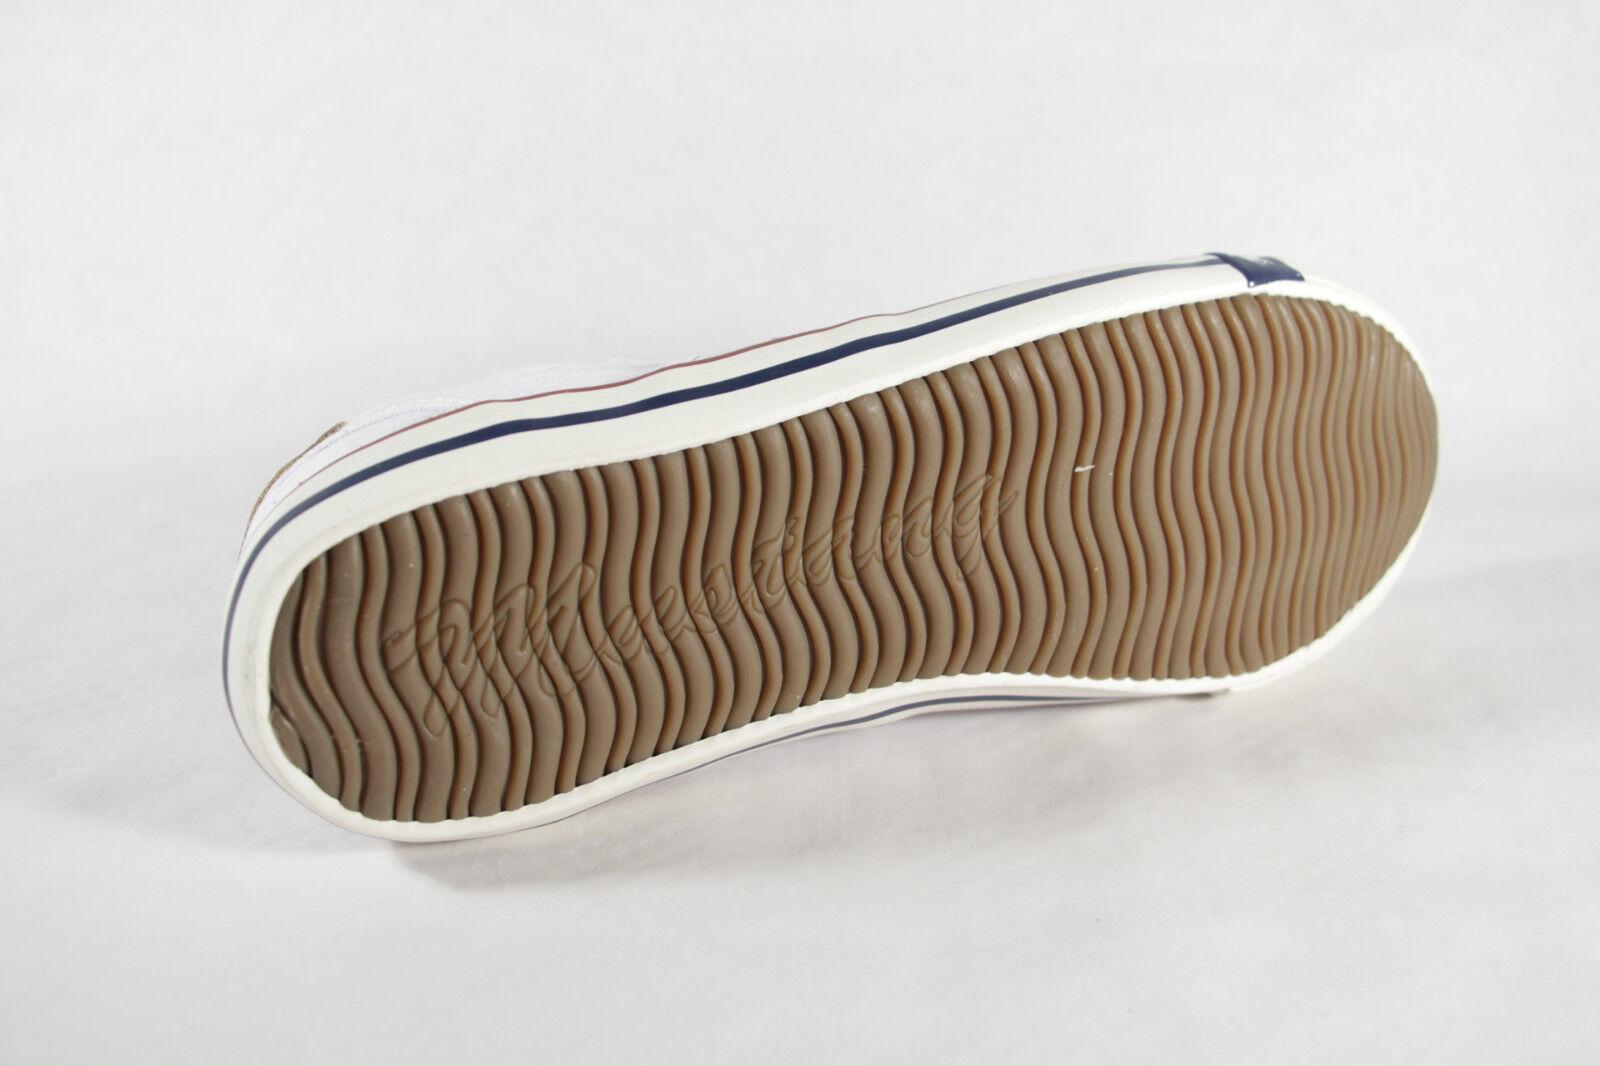 Mustang Slipper Sneakers Halbschuhe Gummisohle weiss Stoff Gummisohle Halbschuhe NEU bcbfaf